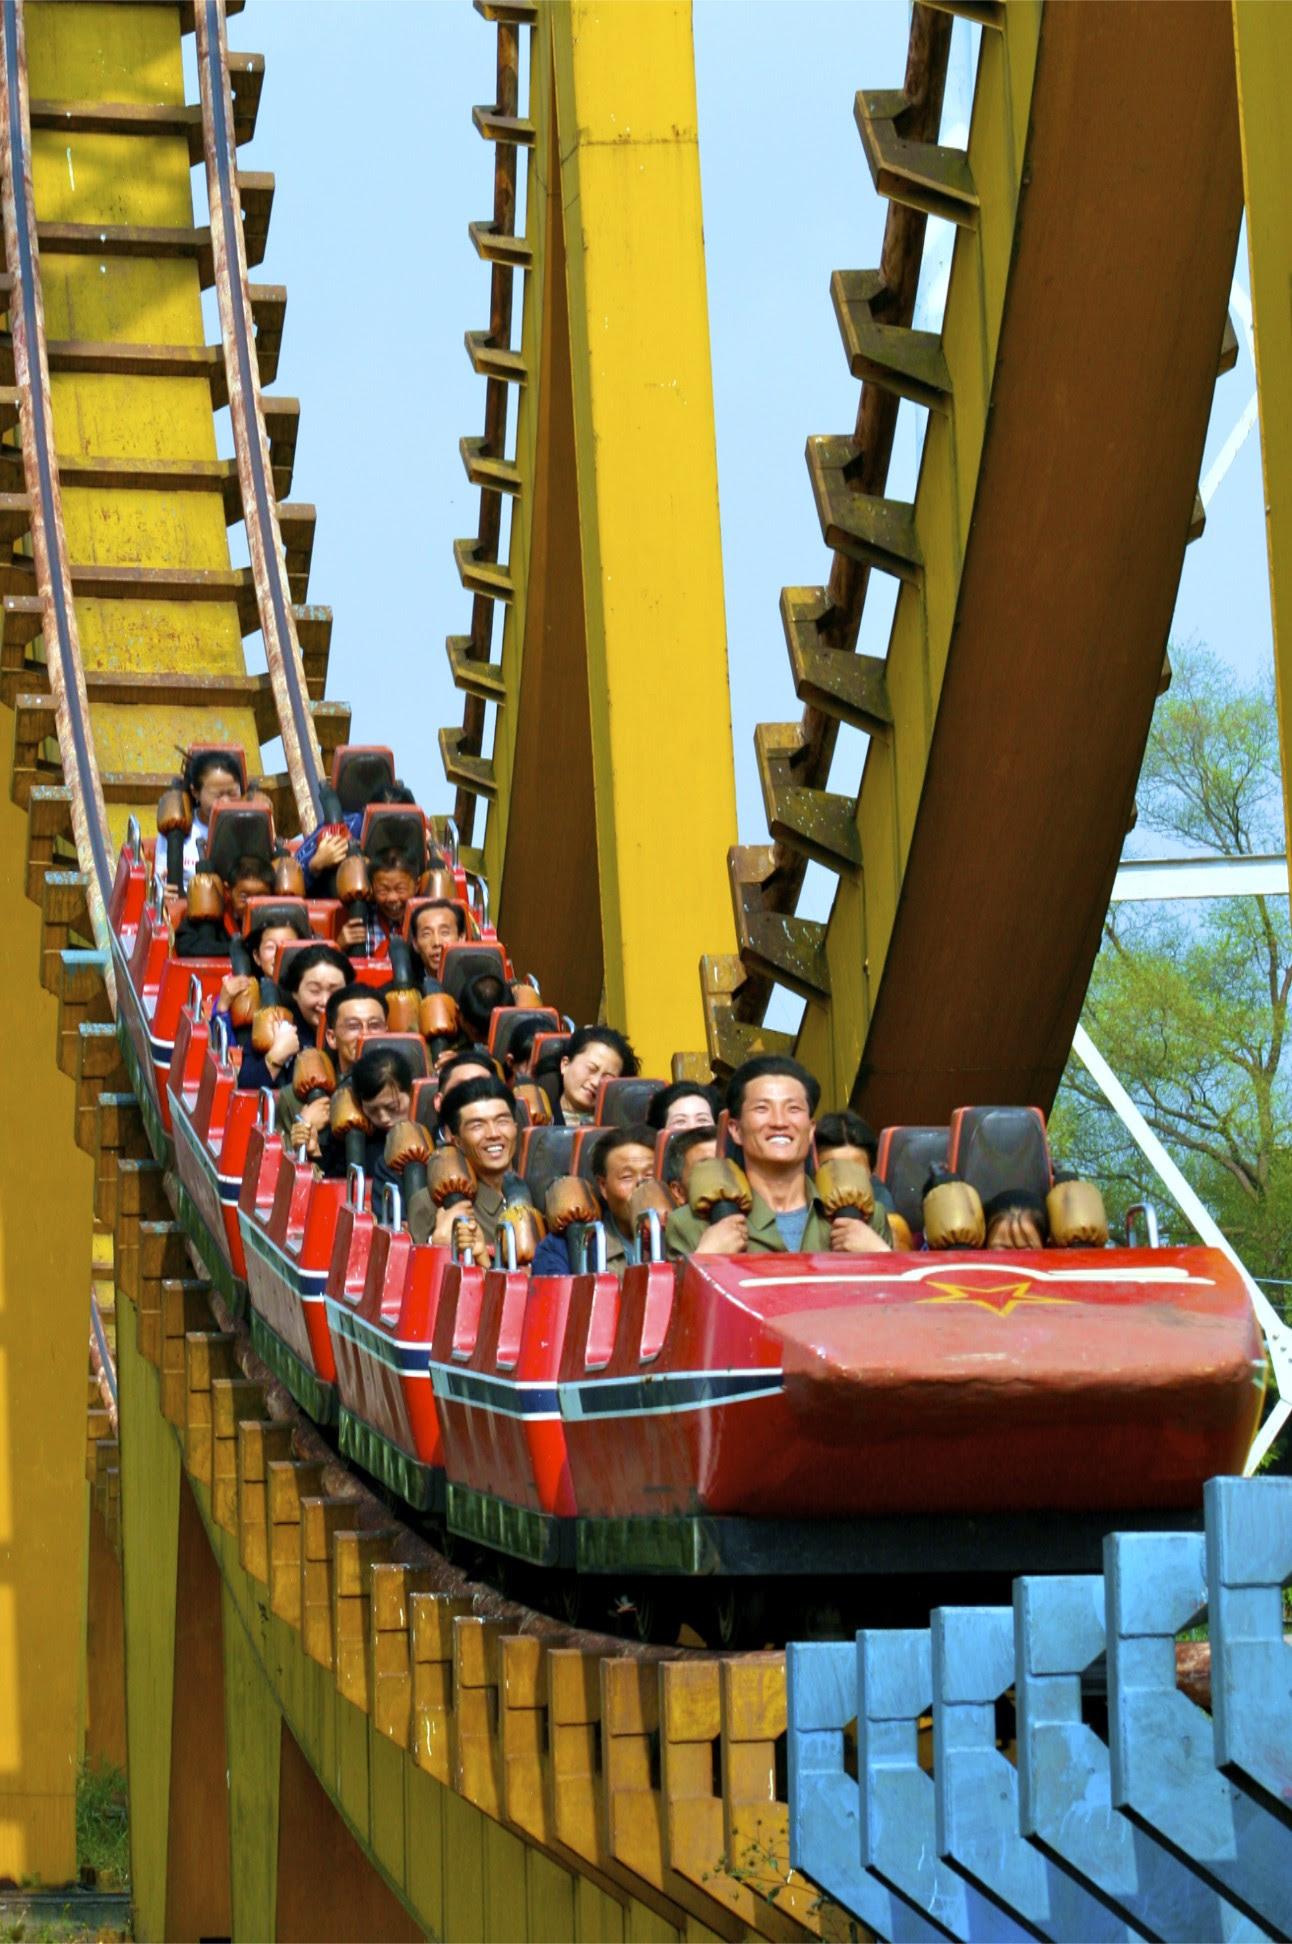 north korean women marching. A North Korea Rollercoaster